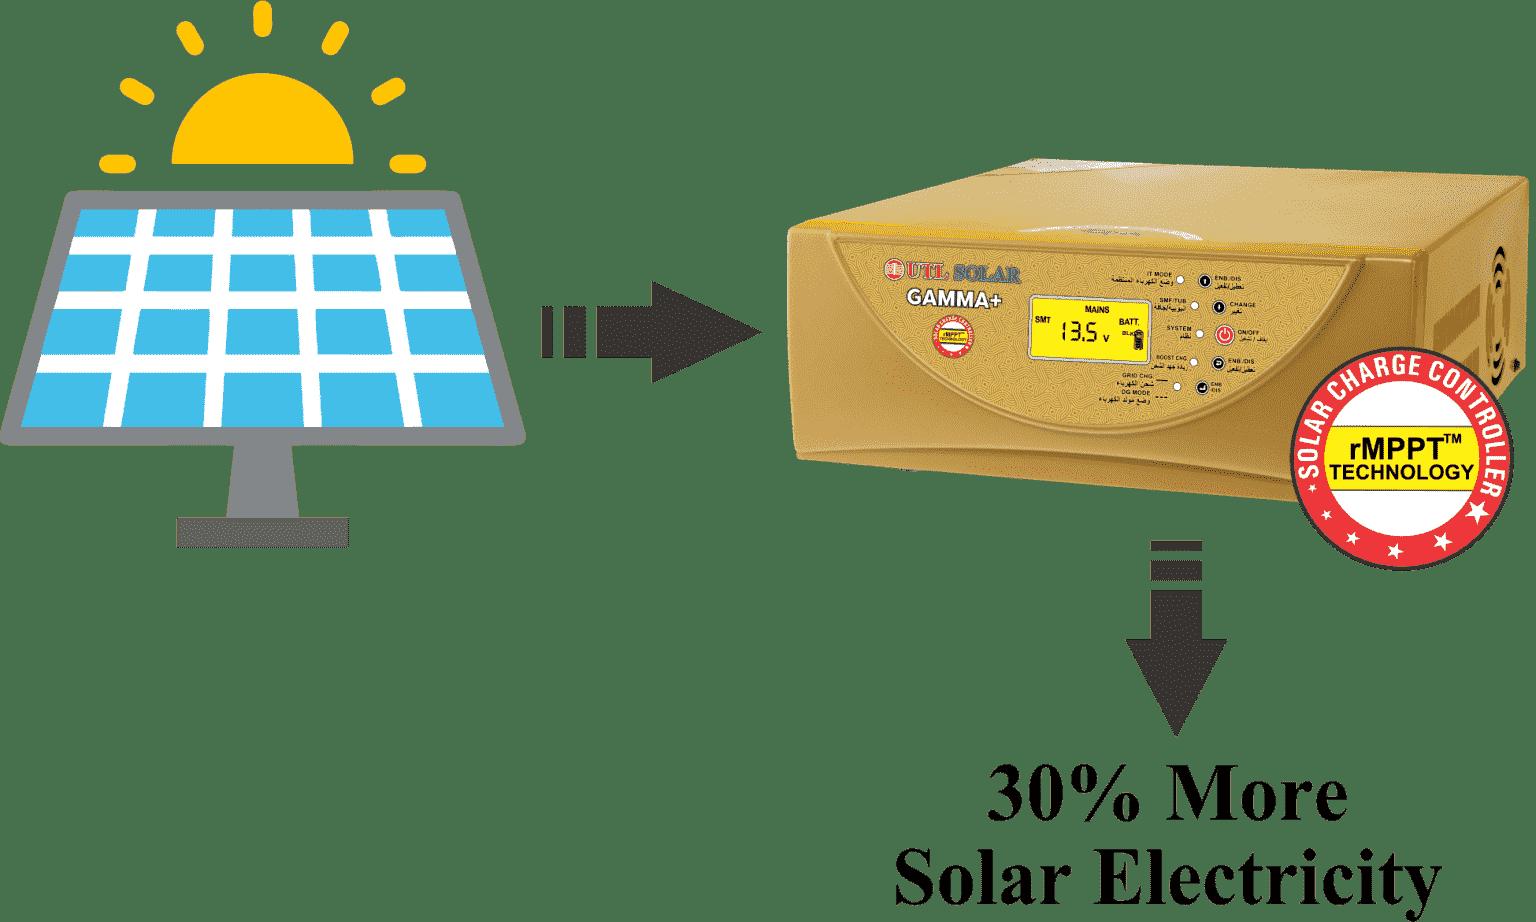 rMPPT technology genrates 30% more power